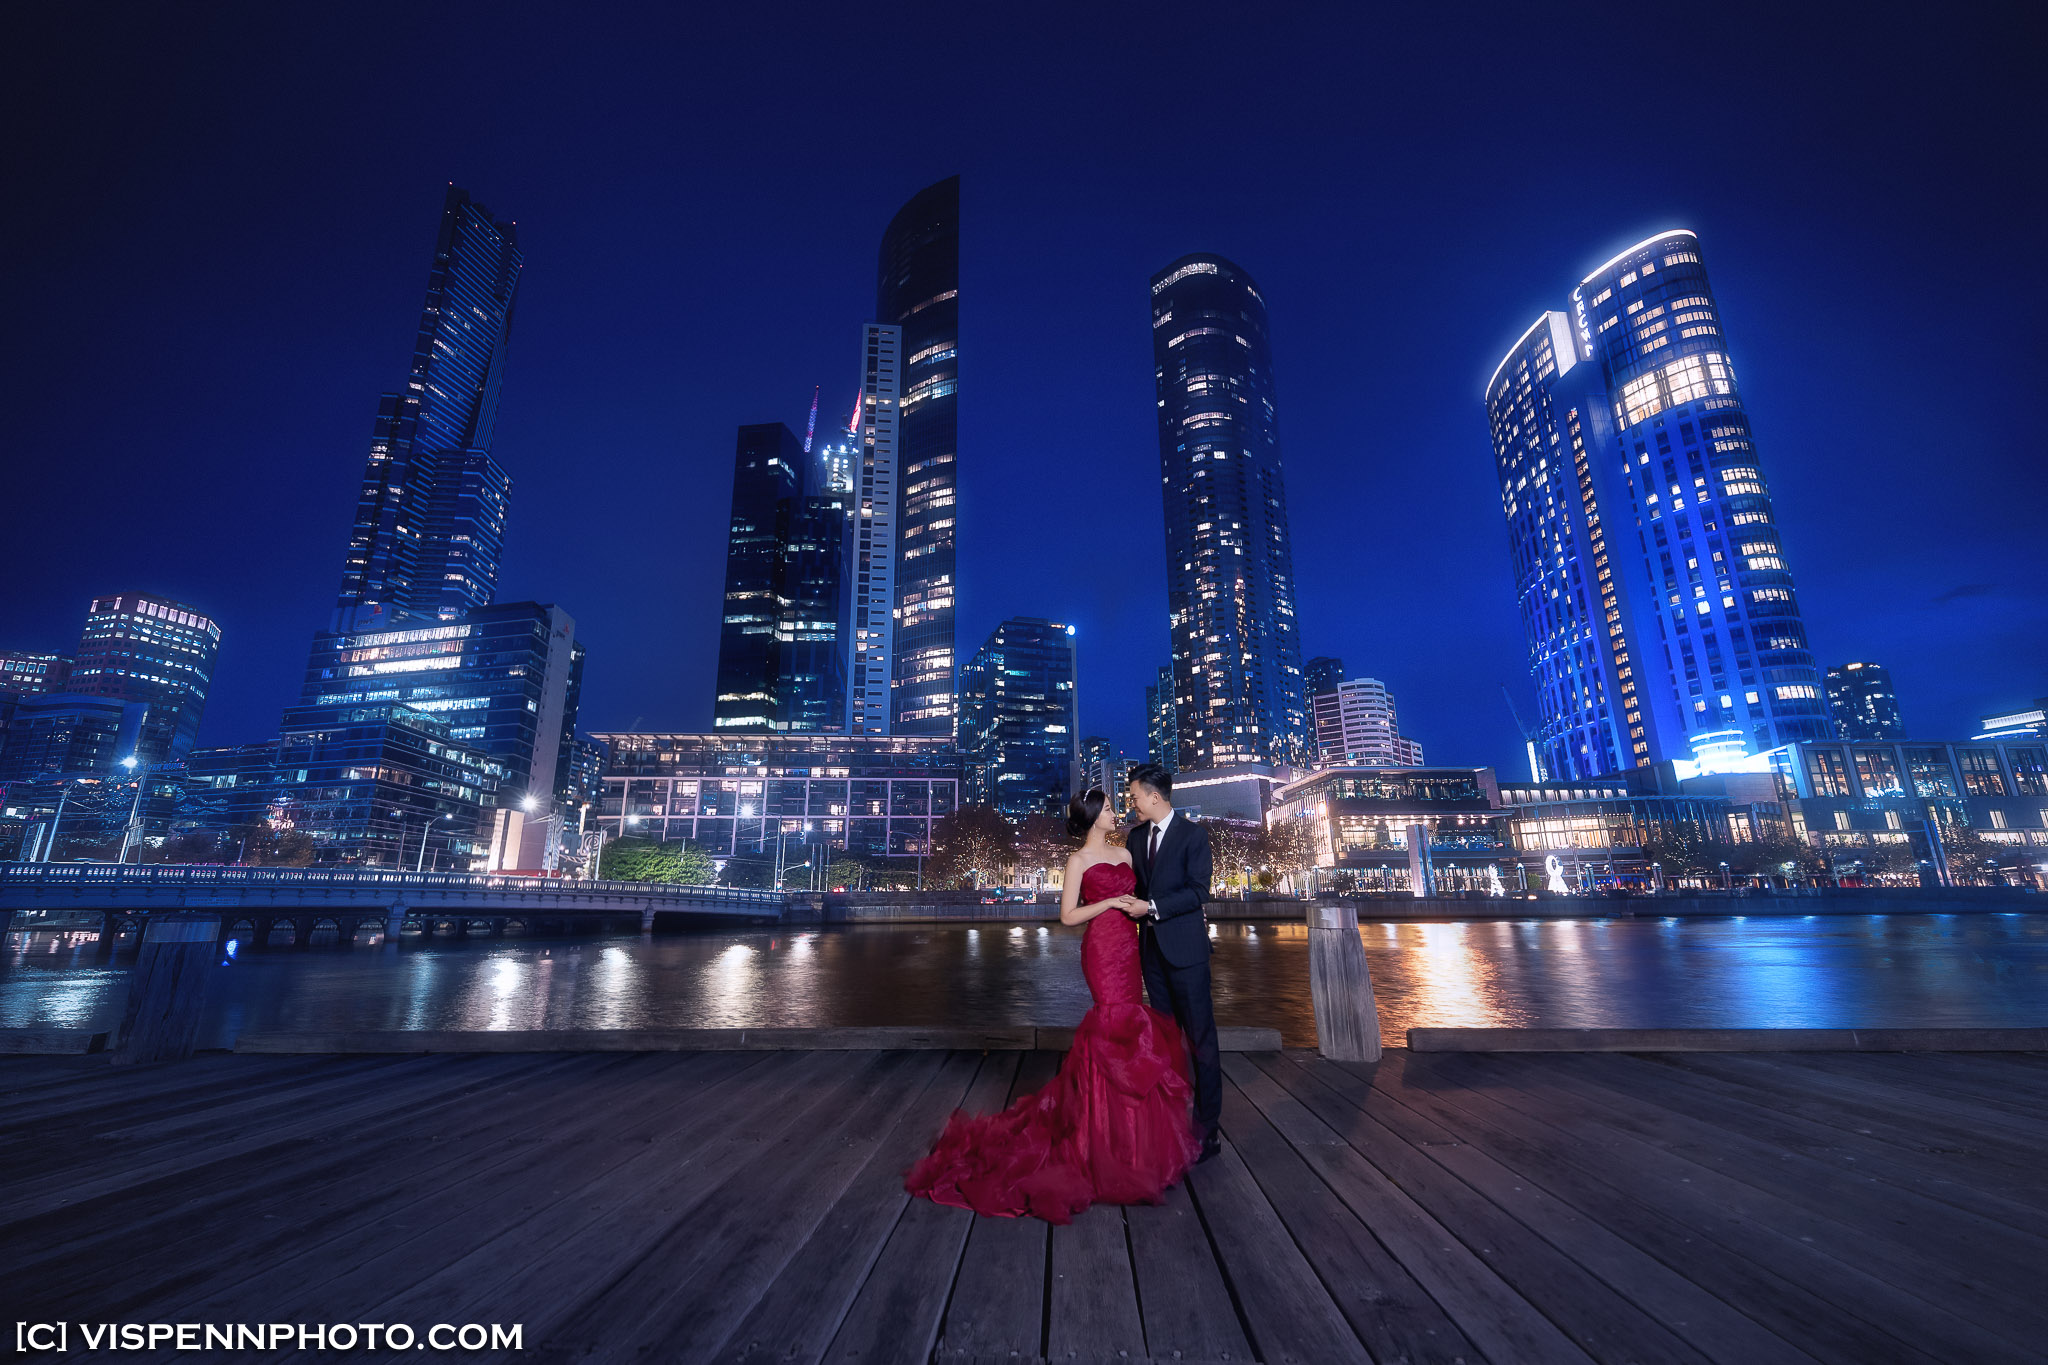 PRE WEDDING Photography Melbourne VISPENN 墨尔本 婚纱照 结婚照 婚纱摄影 AndyCHEN 4427 1DX VISPENN